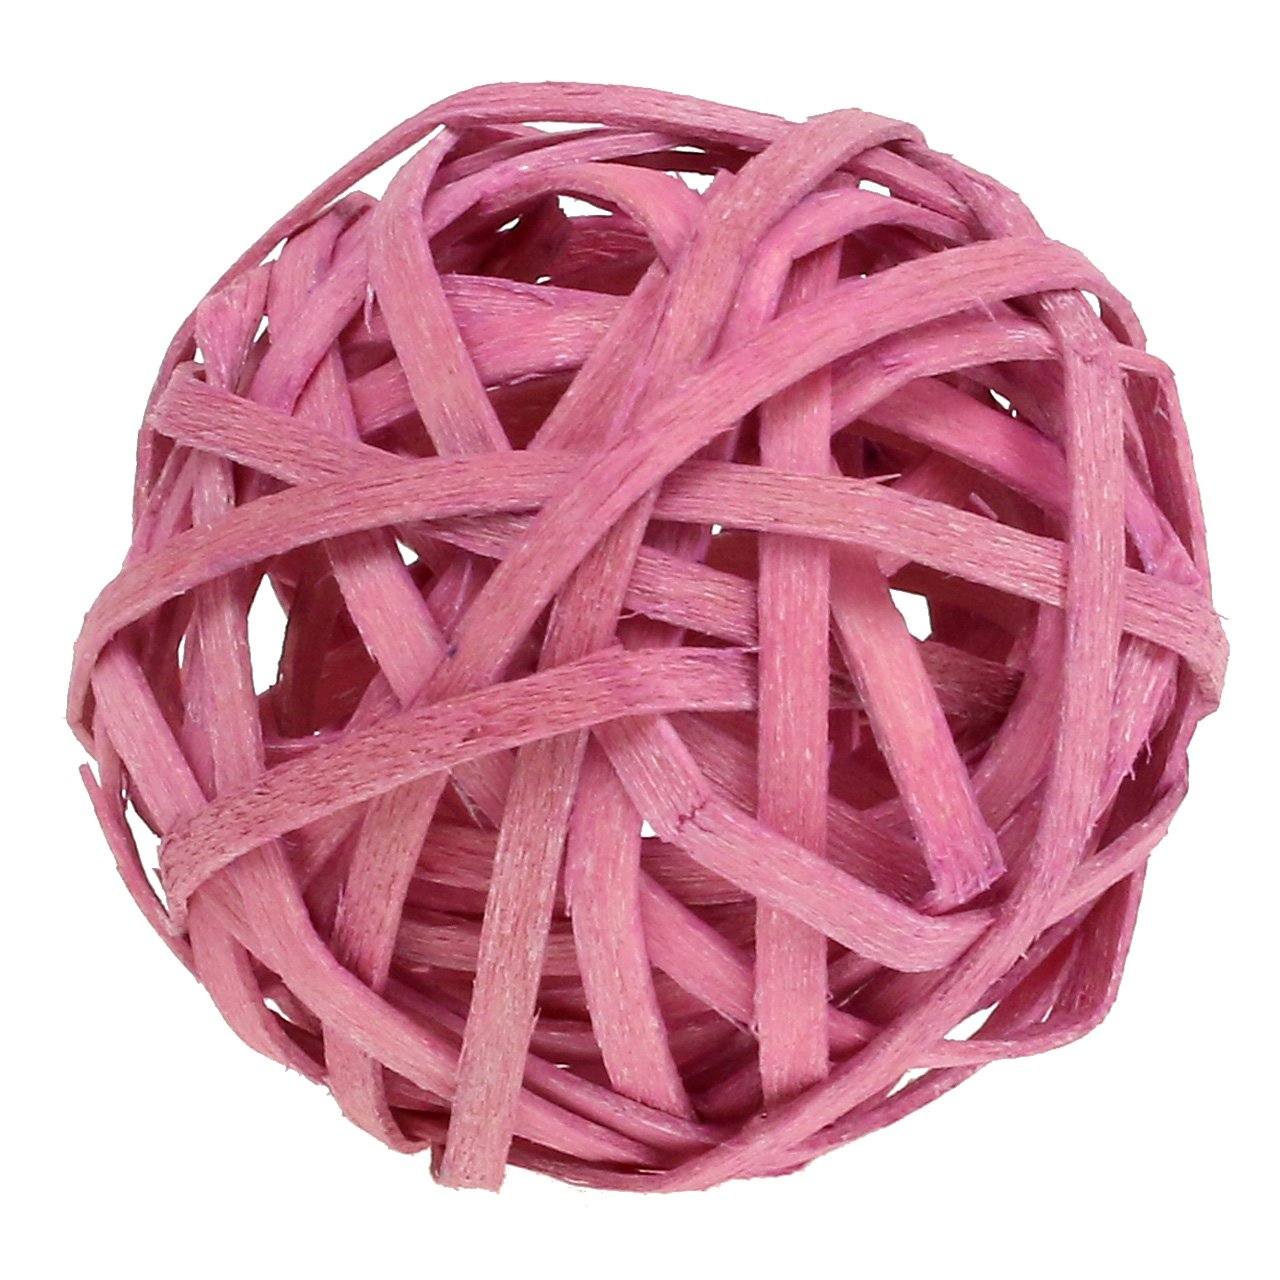 Boule en rotin rose Ø 4 cm 12 p.